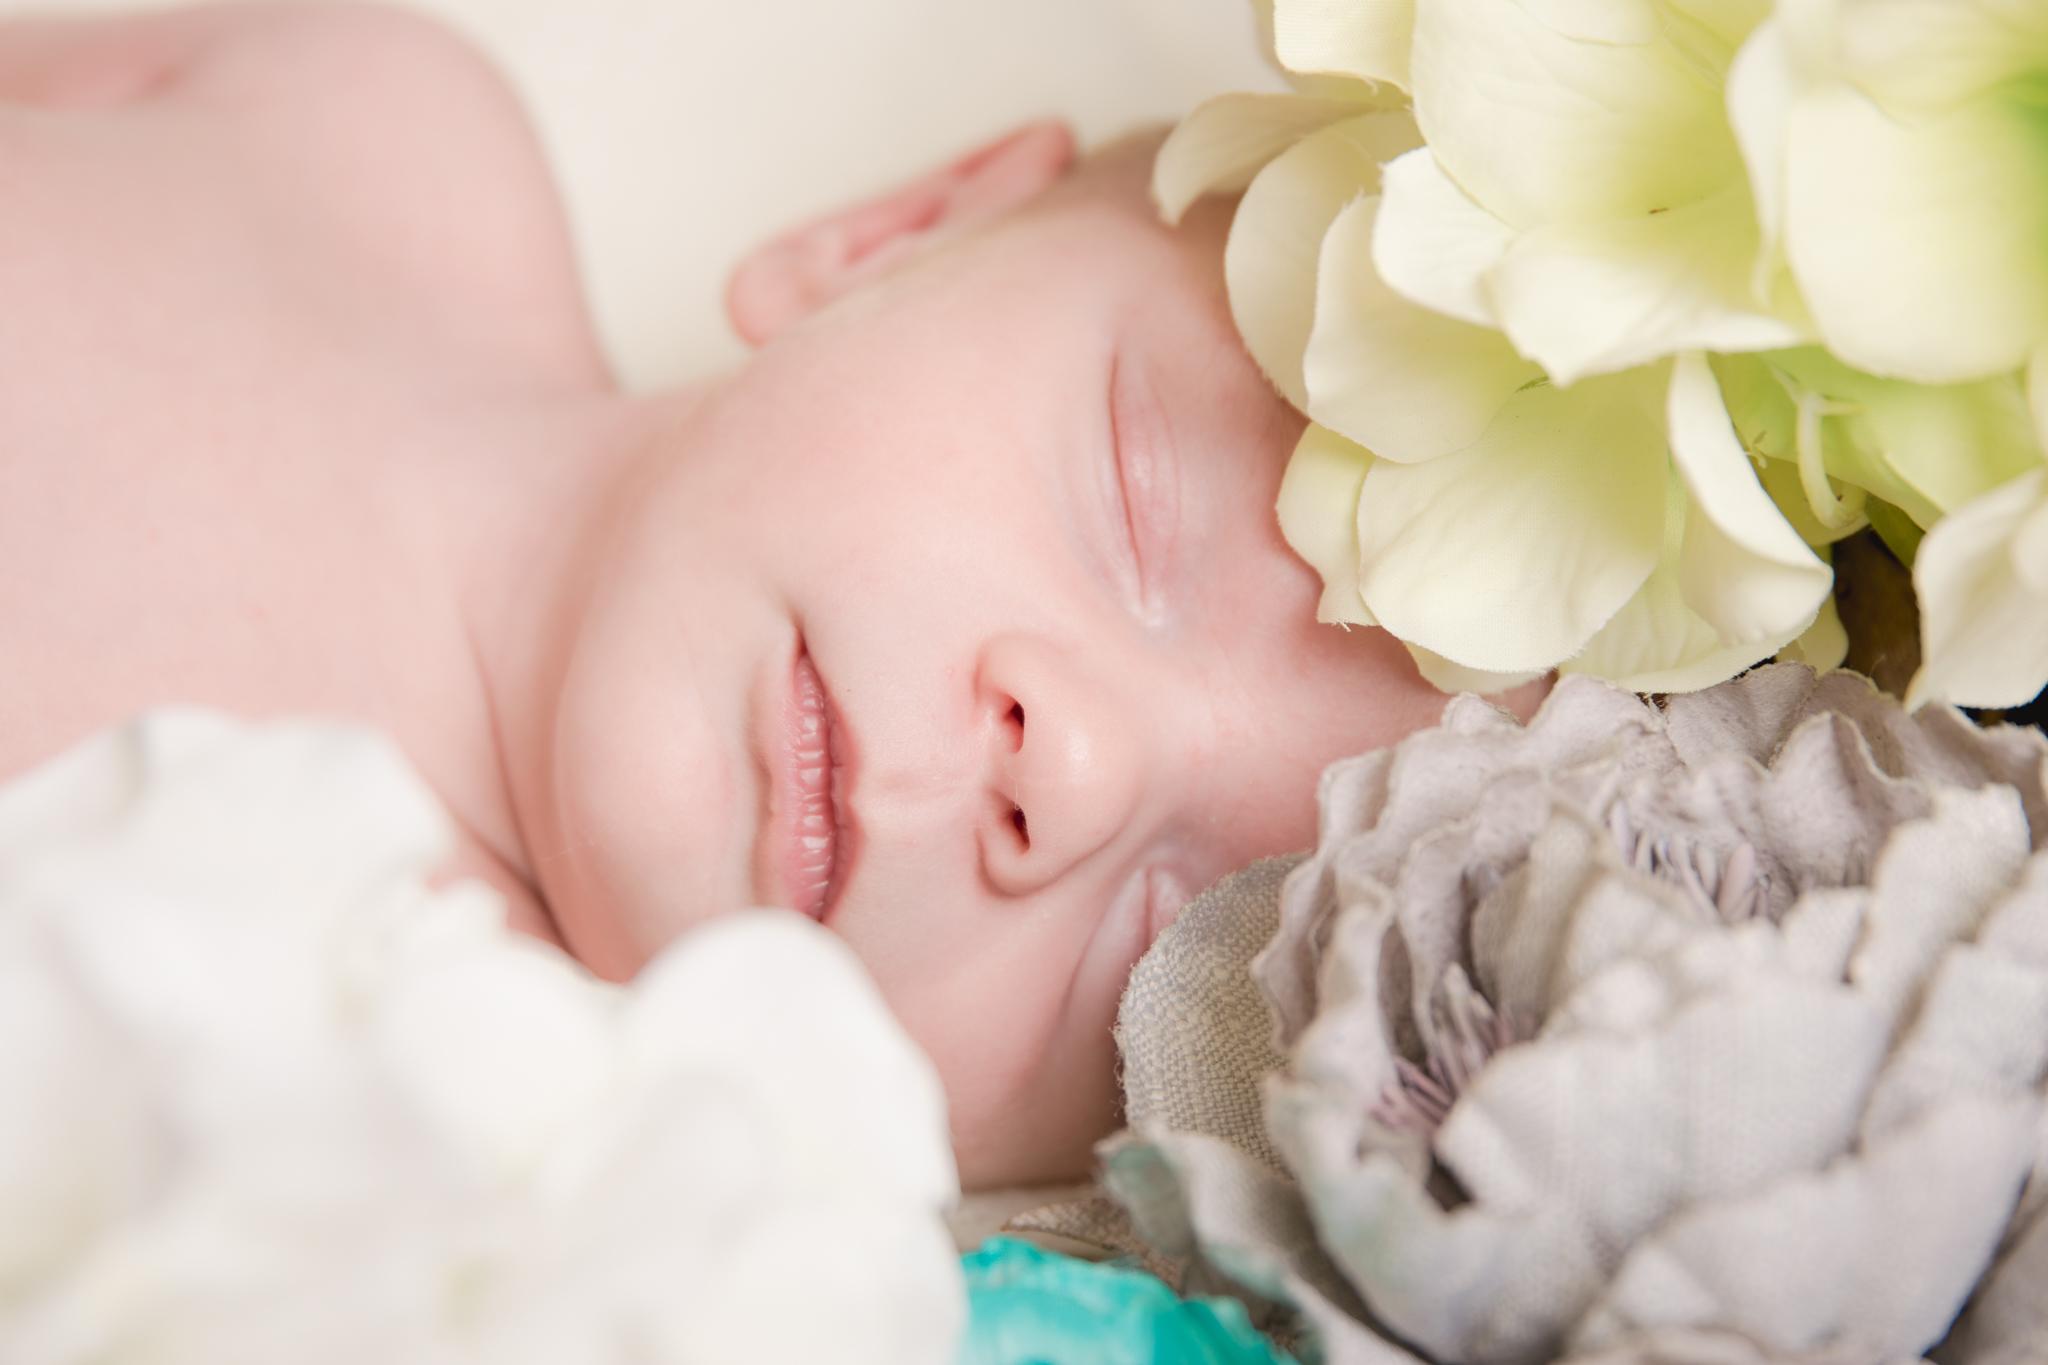 DSC_0314 Newborn Edits with MCP Lightroom Presets